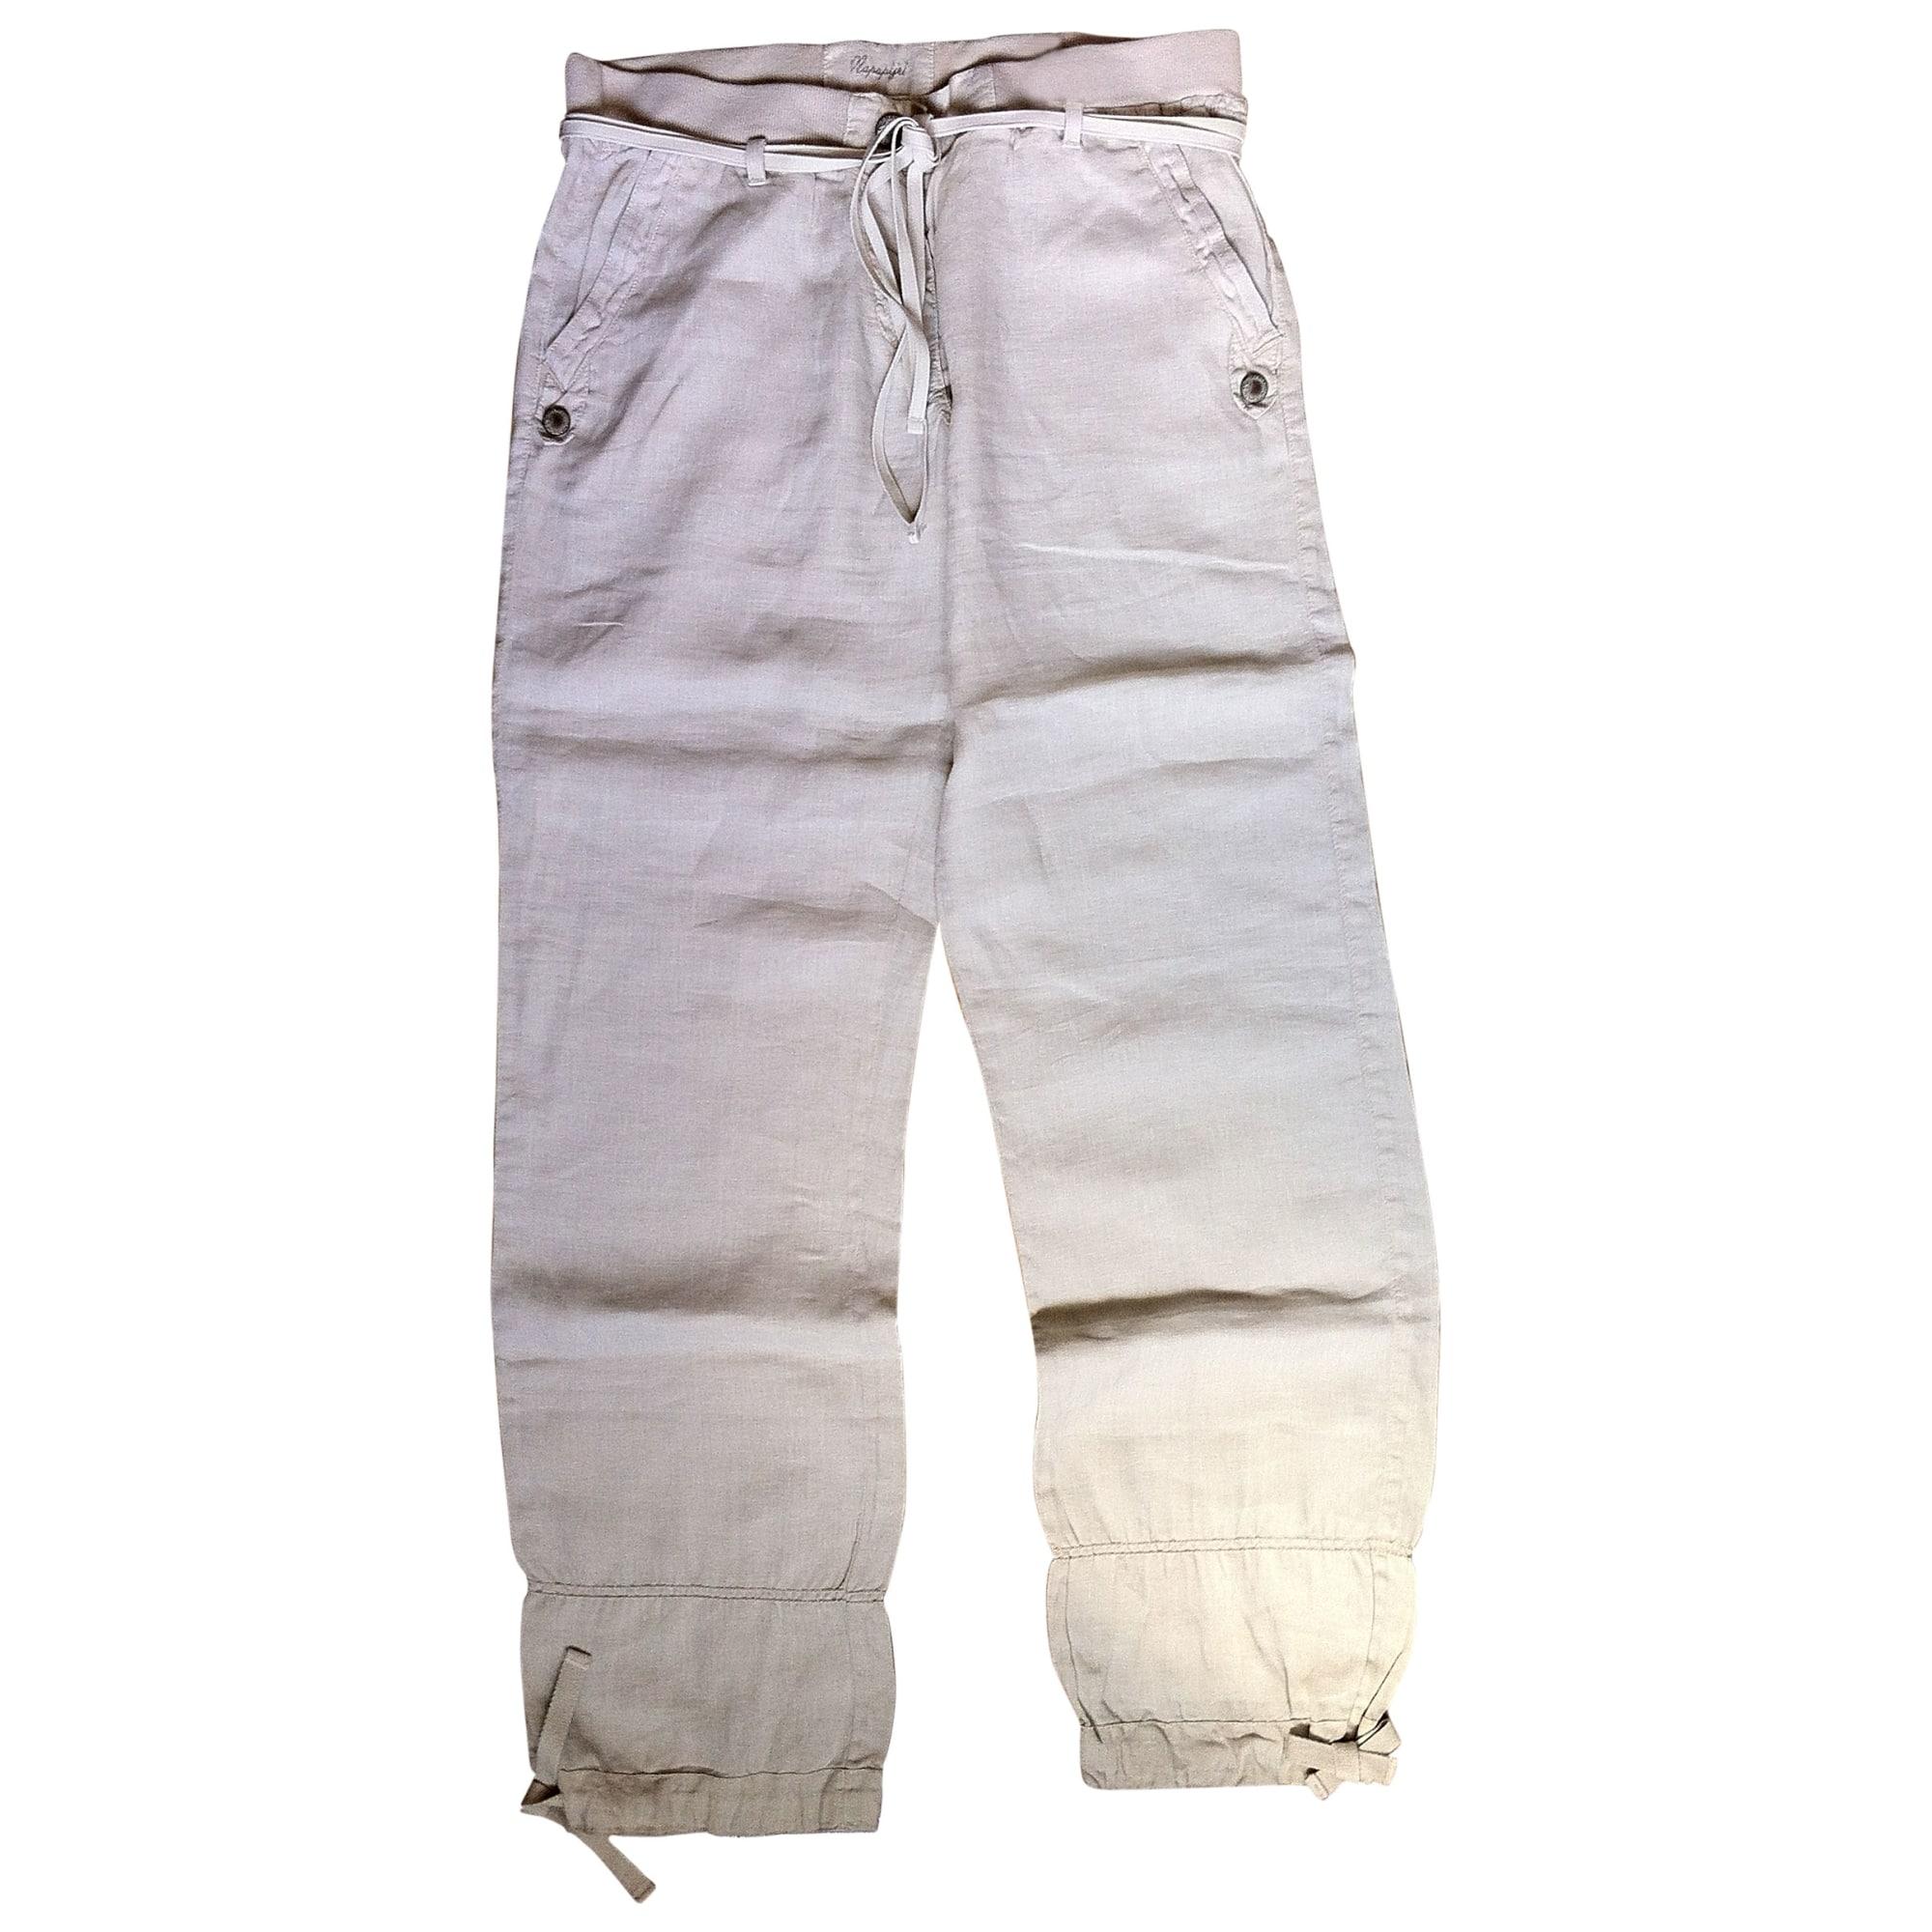 Pantalon lxl Par Napapijri 42 Vendu Beige Dom32260 Droit T4 ww6fBvzHq